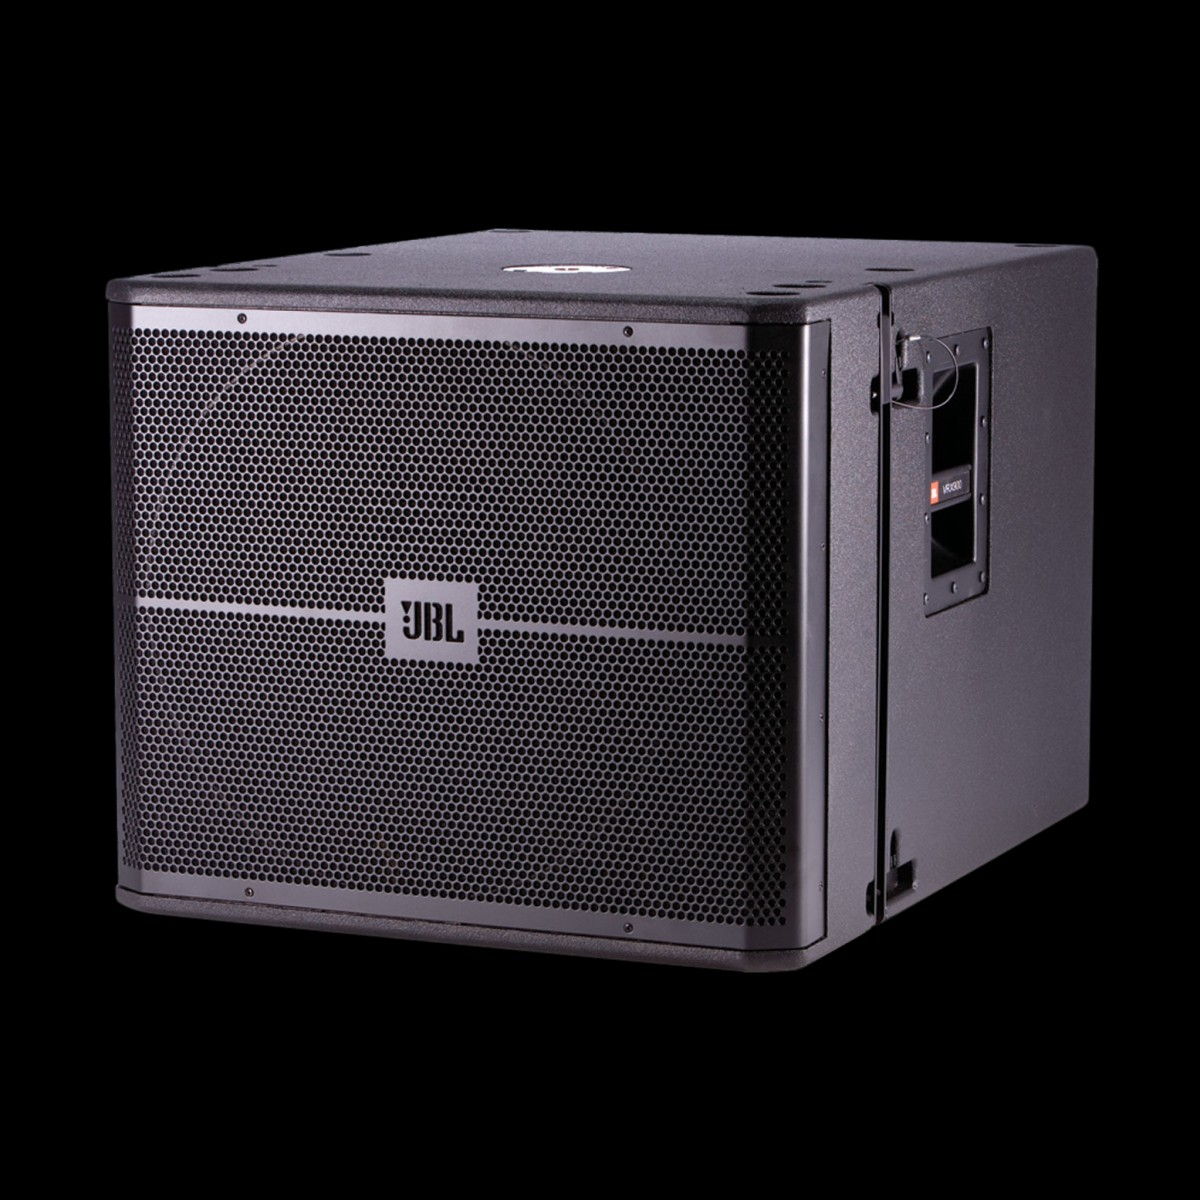 jbl vrx900 vrx918 s grille voor luidsprekerhoes strongline